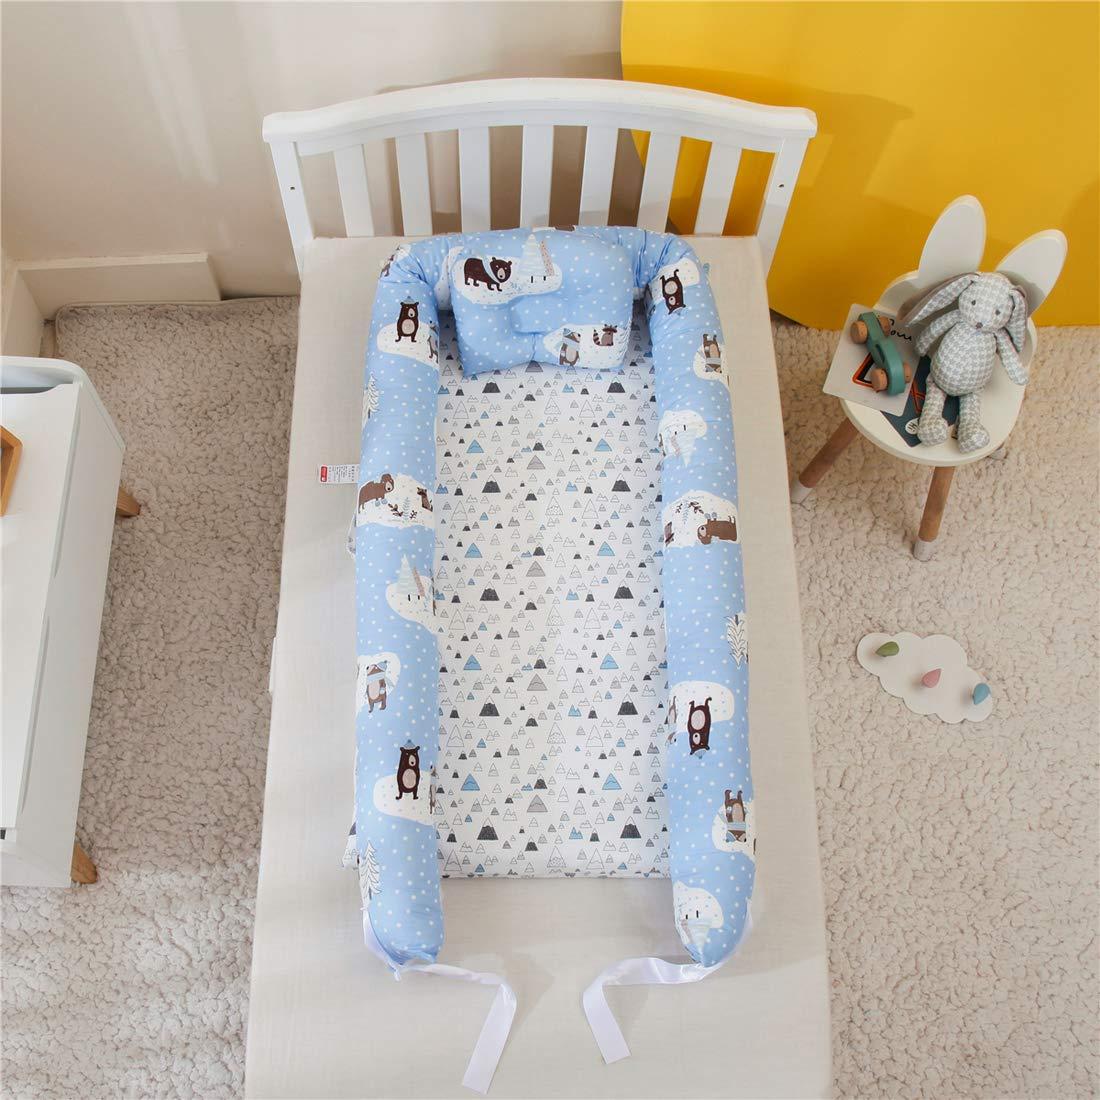 DorkasDE Babynest Kuschelnest Matratze im Bett Faltbett Babybett Reisebett